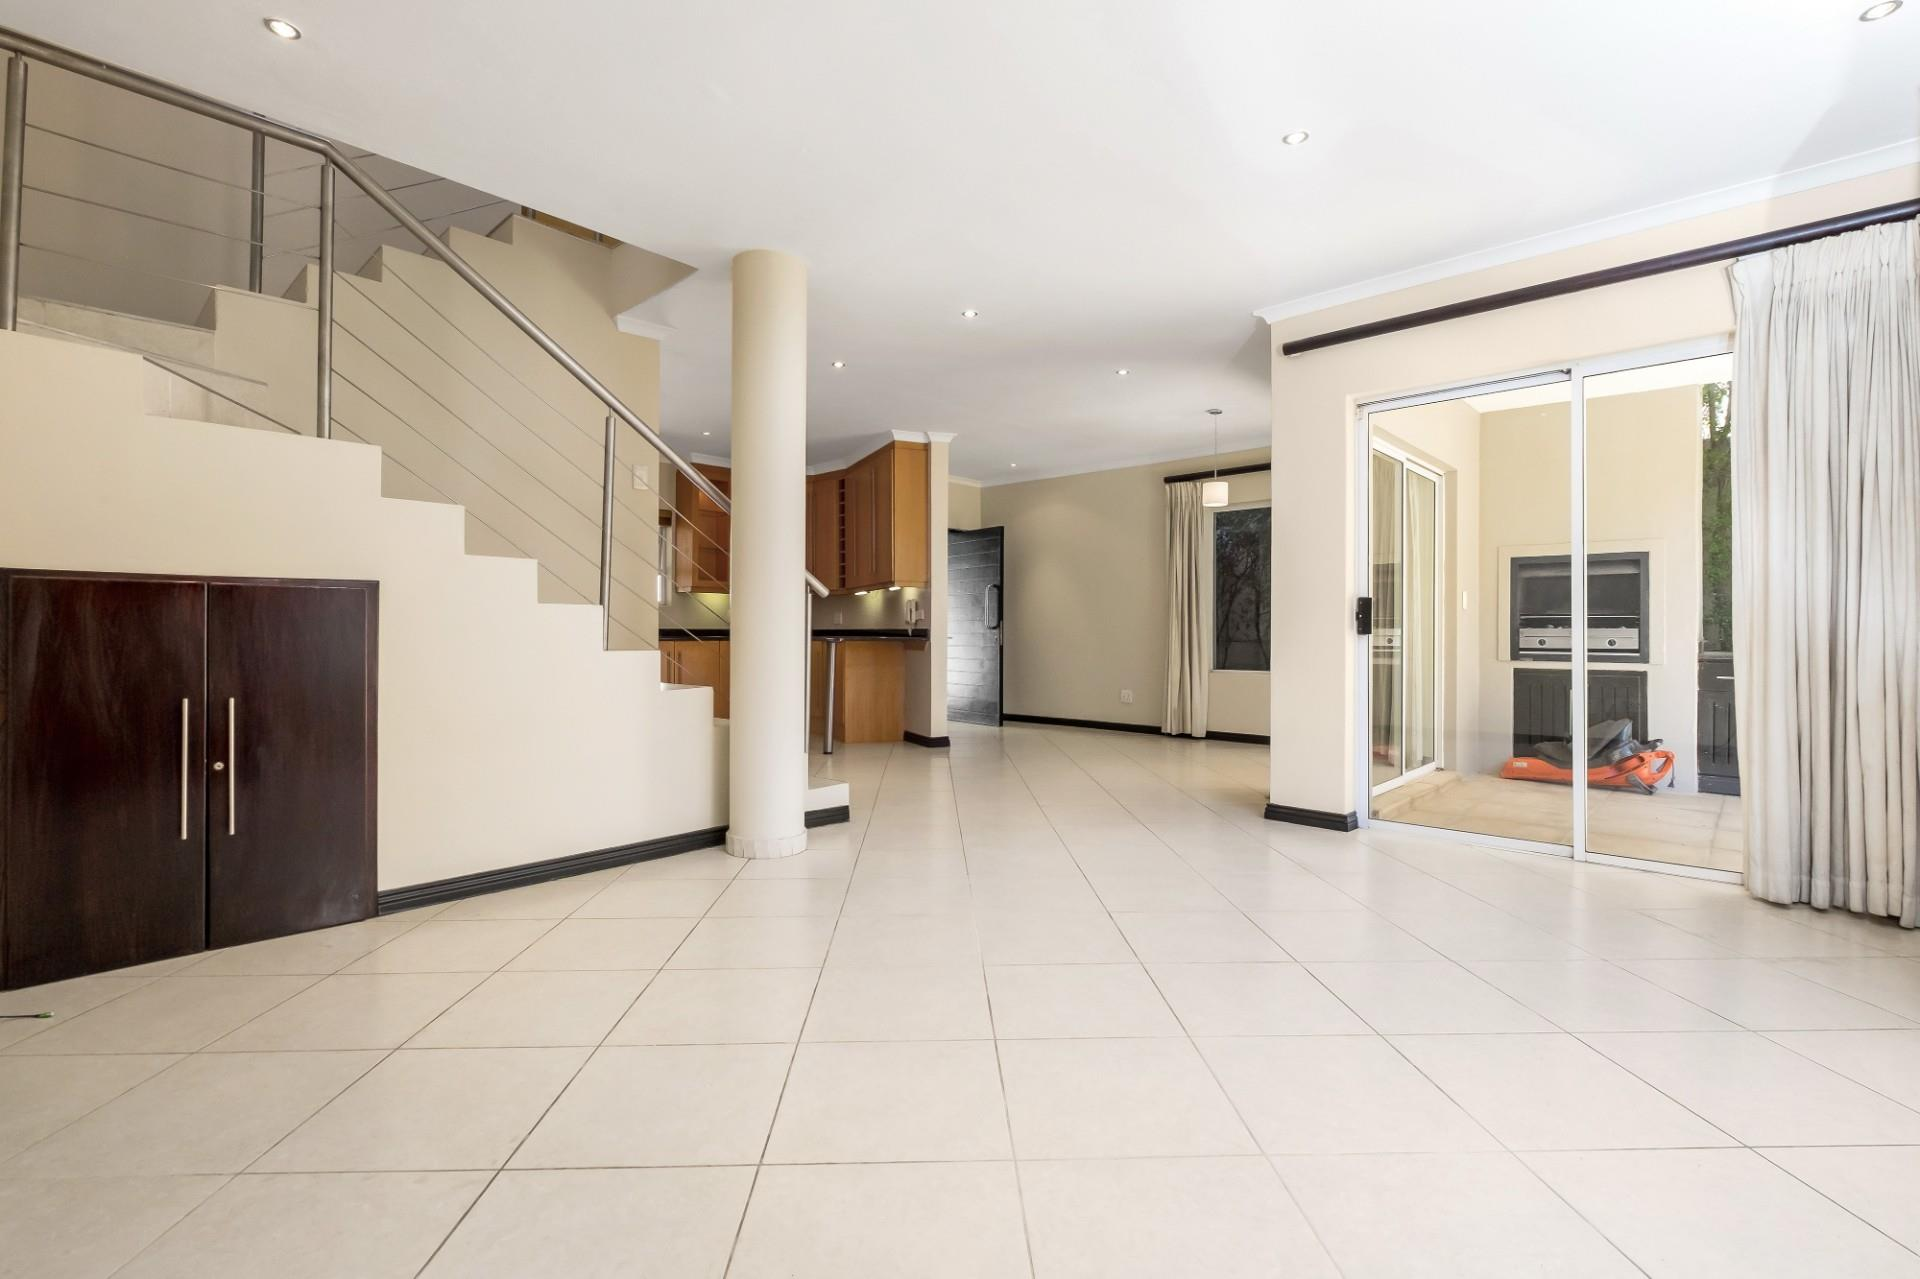 3 Bedroom Townhouse For Sale in Sandown